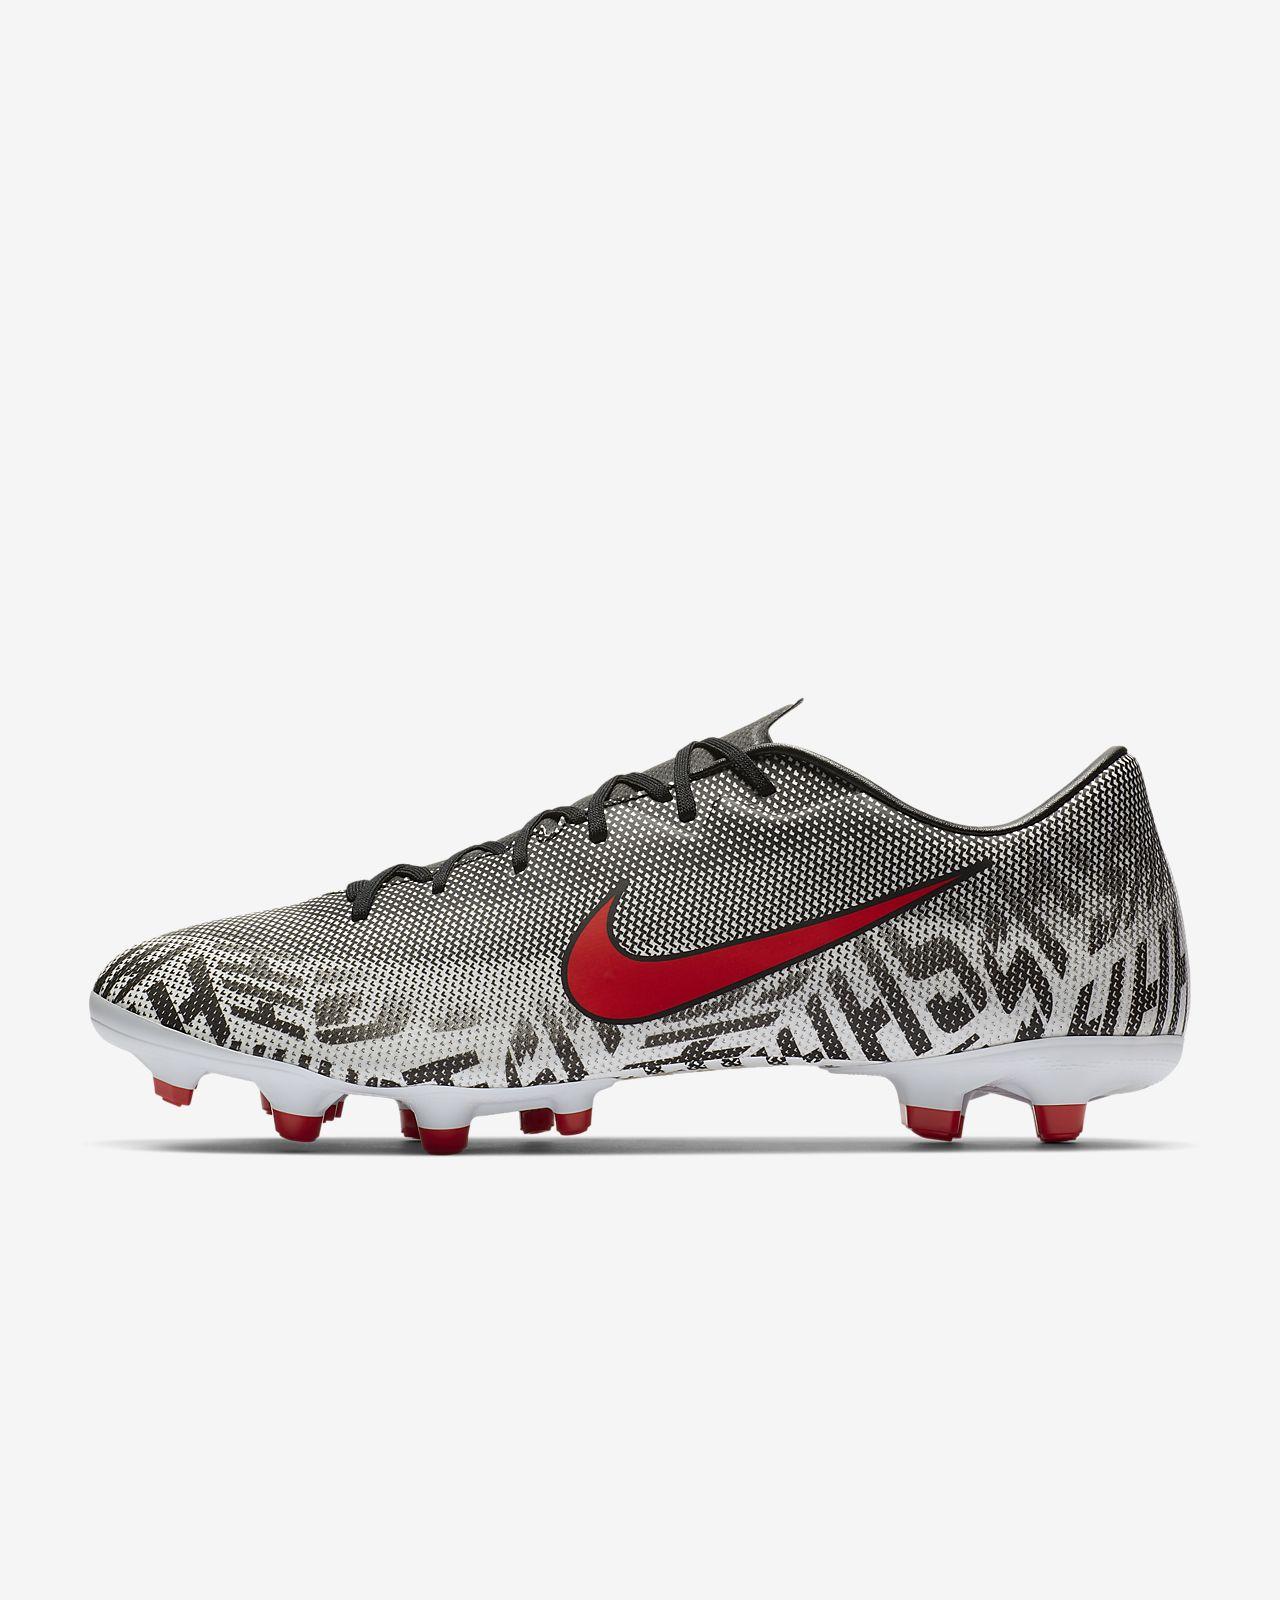 Nike Mercurial Vapor XII Academy Neymar-fodboldstøvle (flere typer underlag)